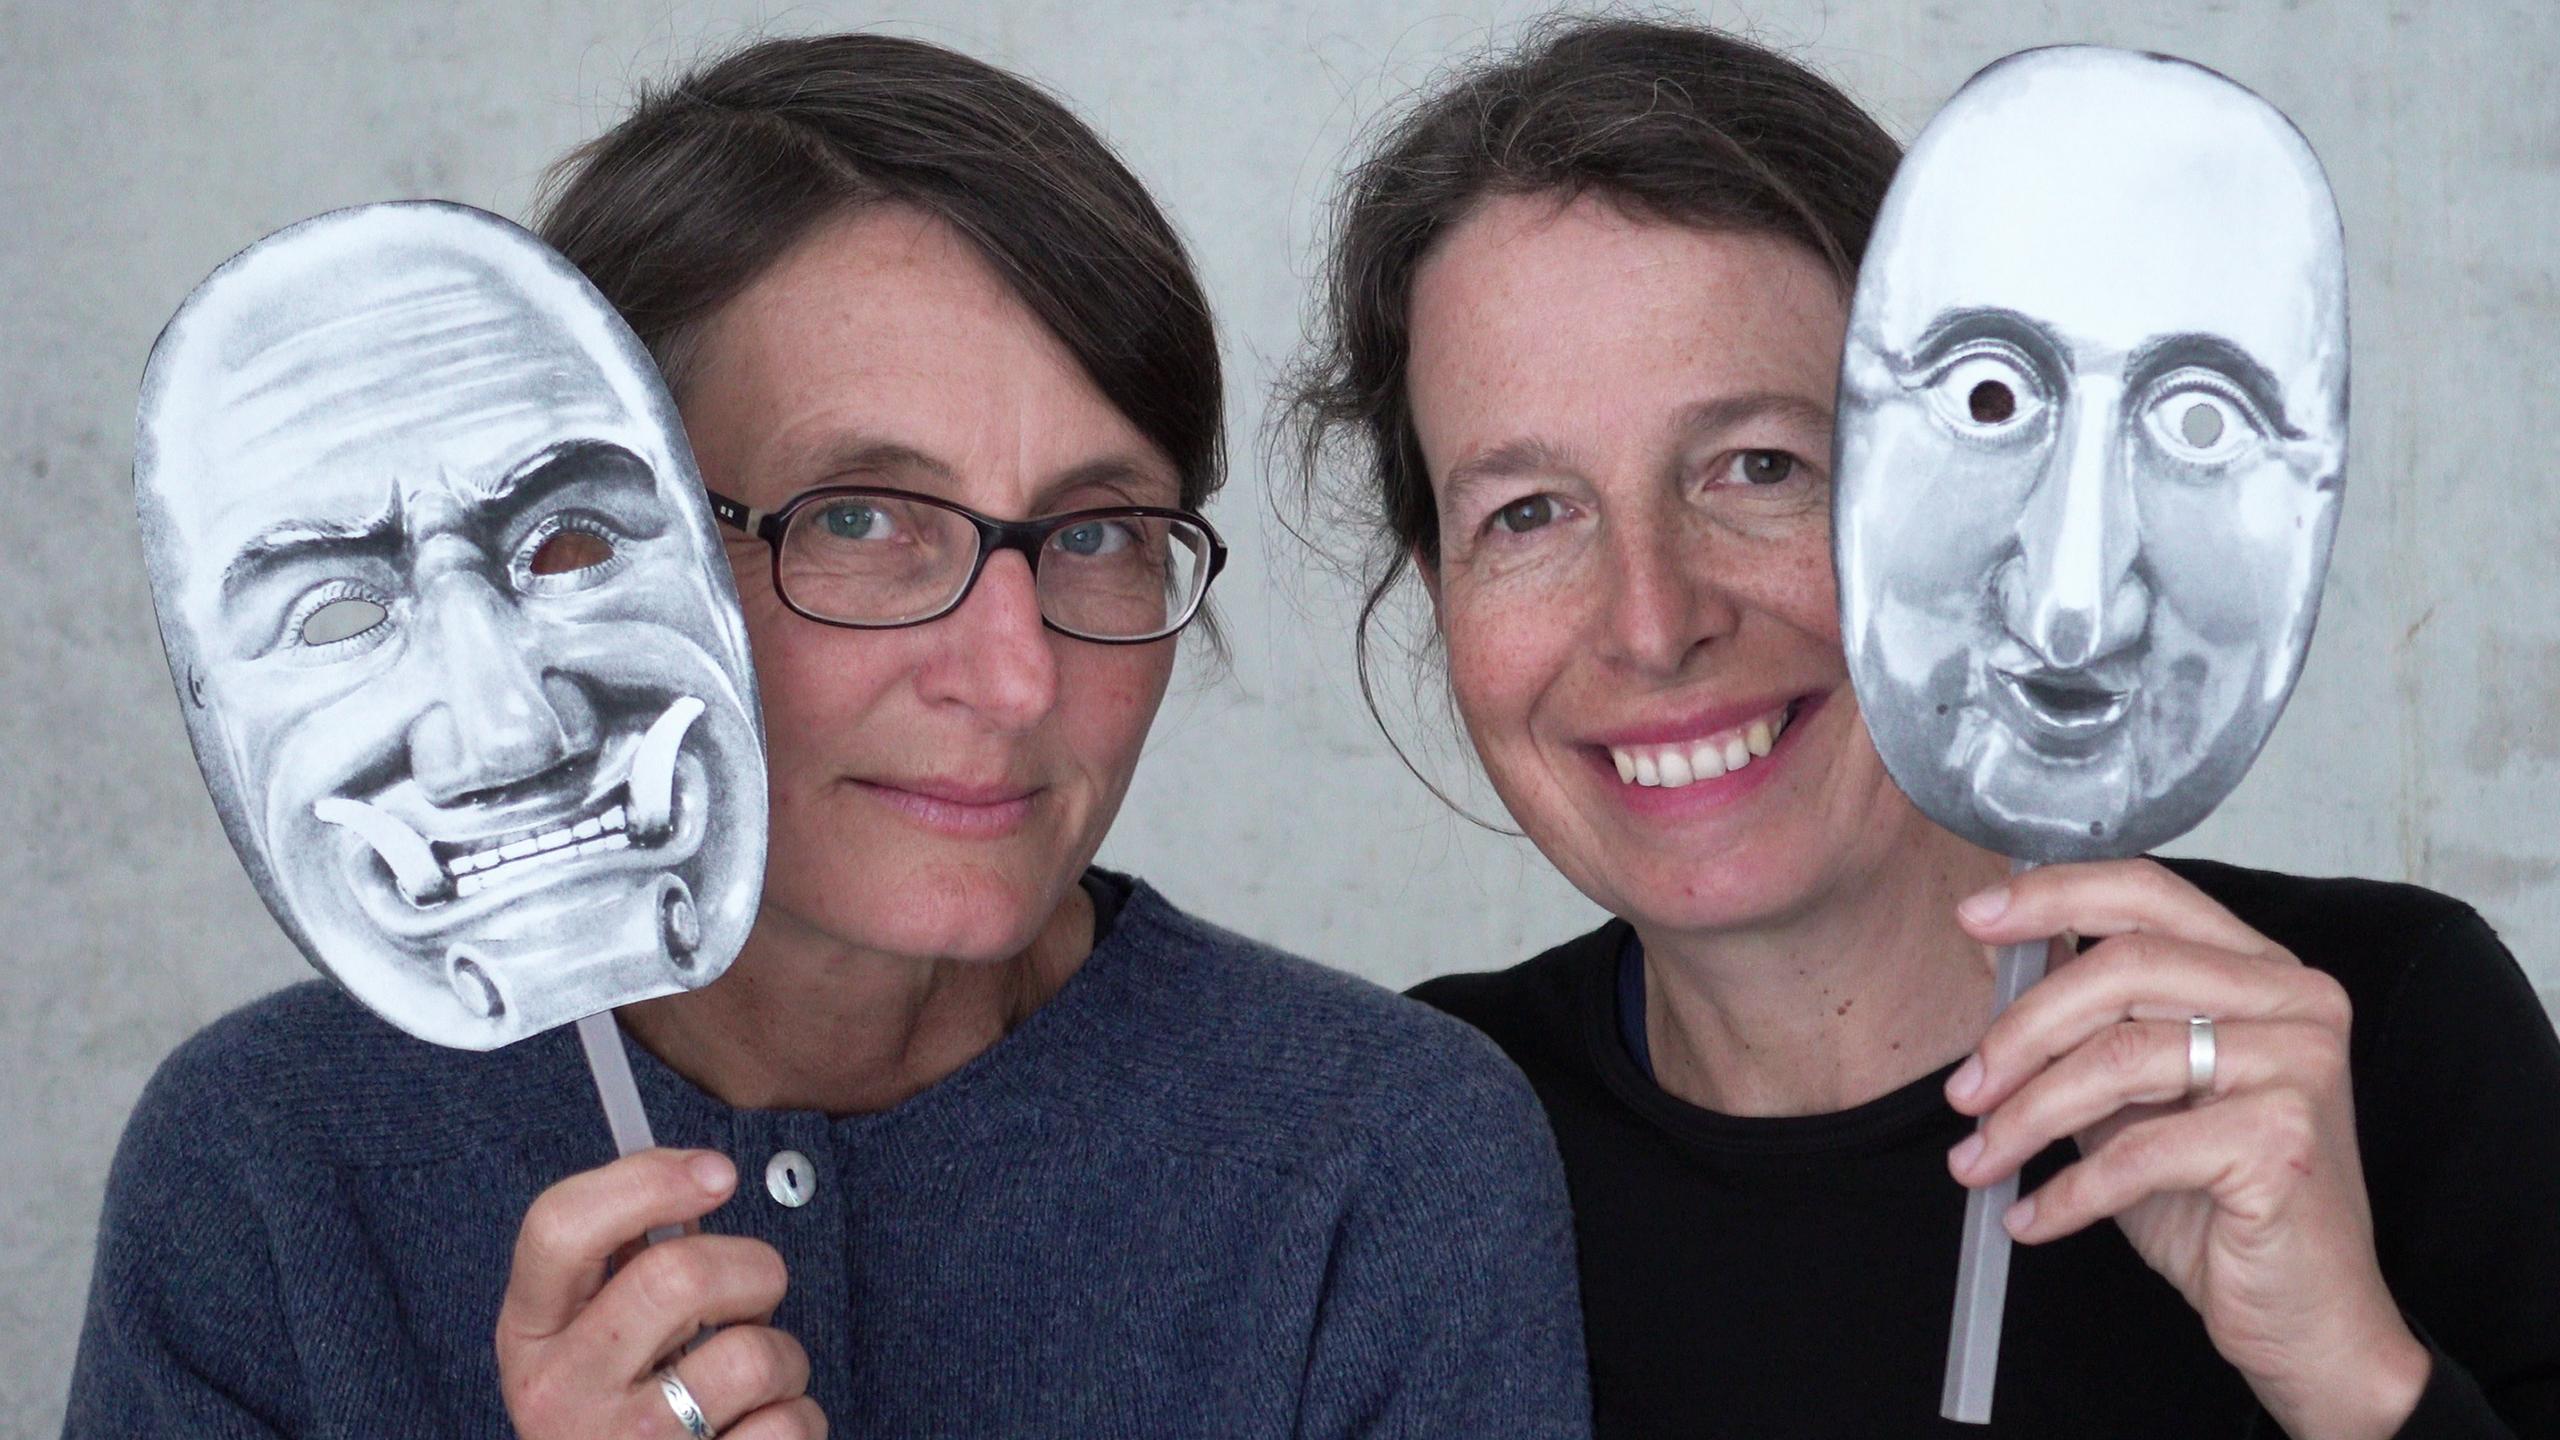 Regie: Wiltrud Baier, Sigrun Köhler / Böller und Brot